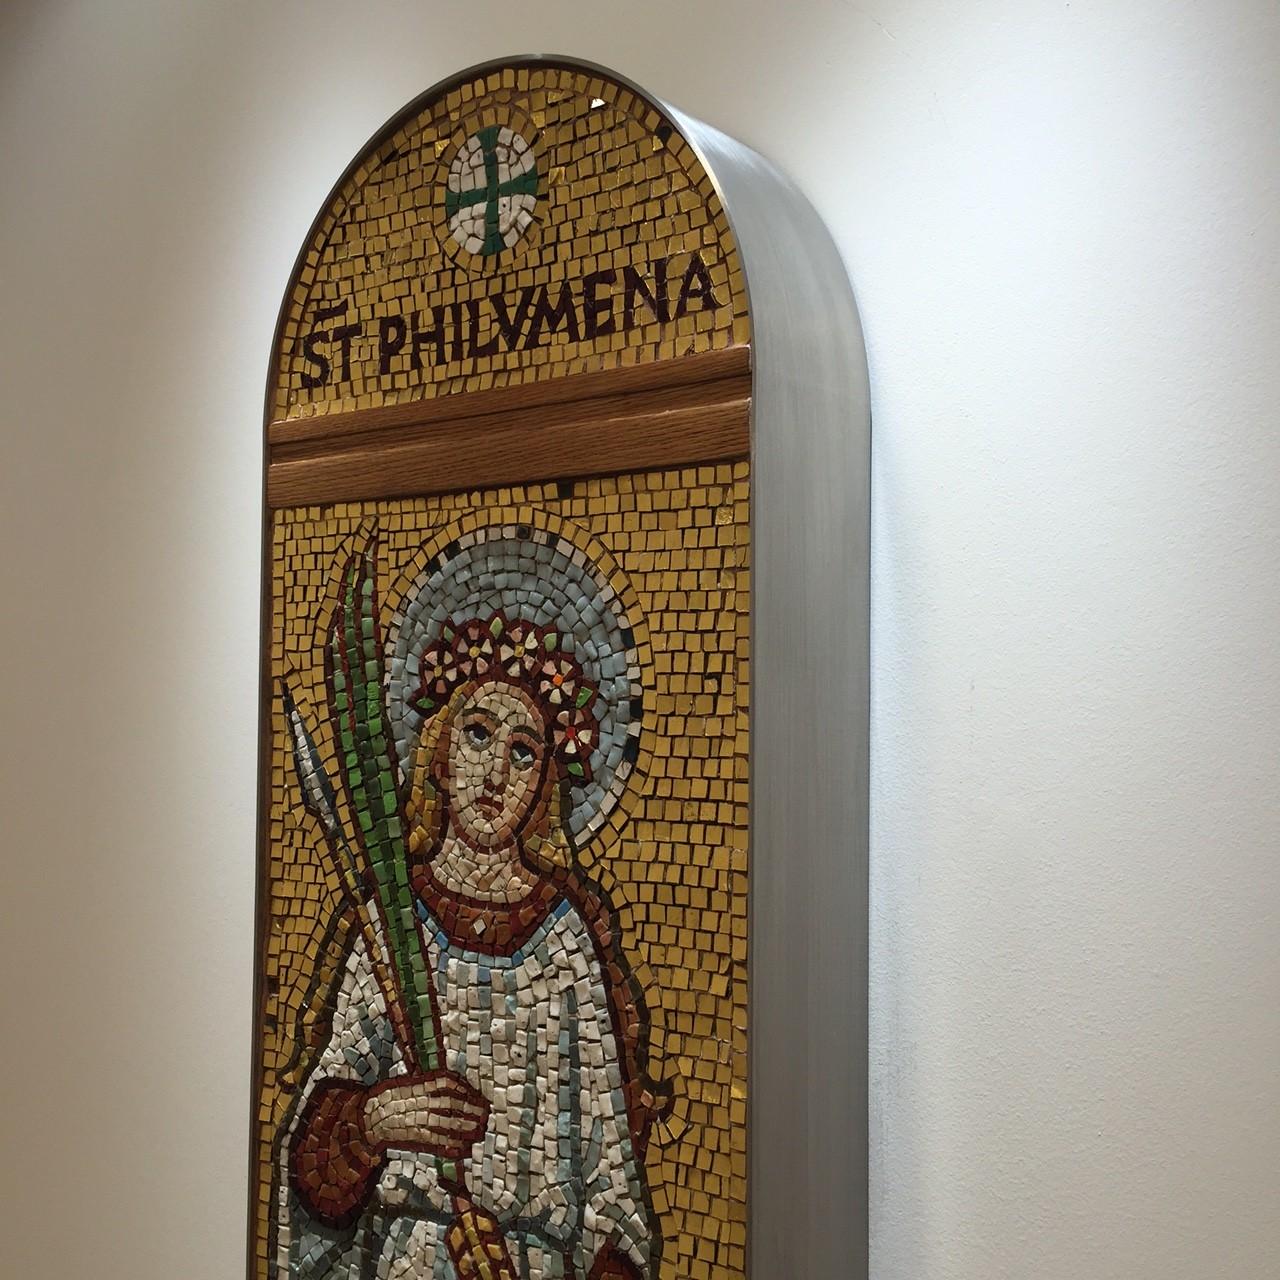 father-hudson-society-mosaic-restoration-1